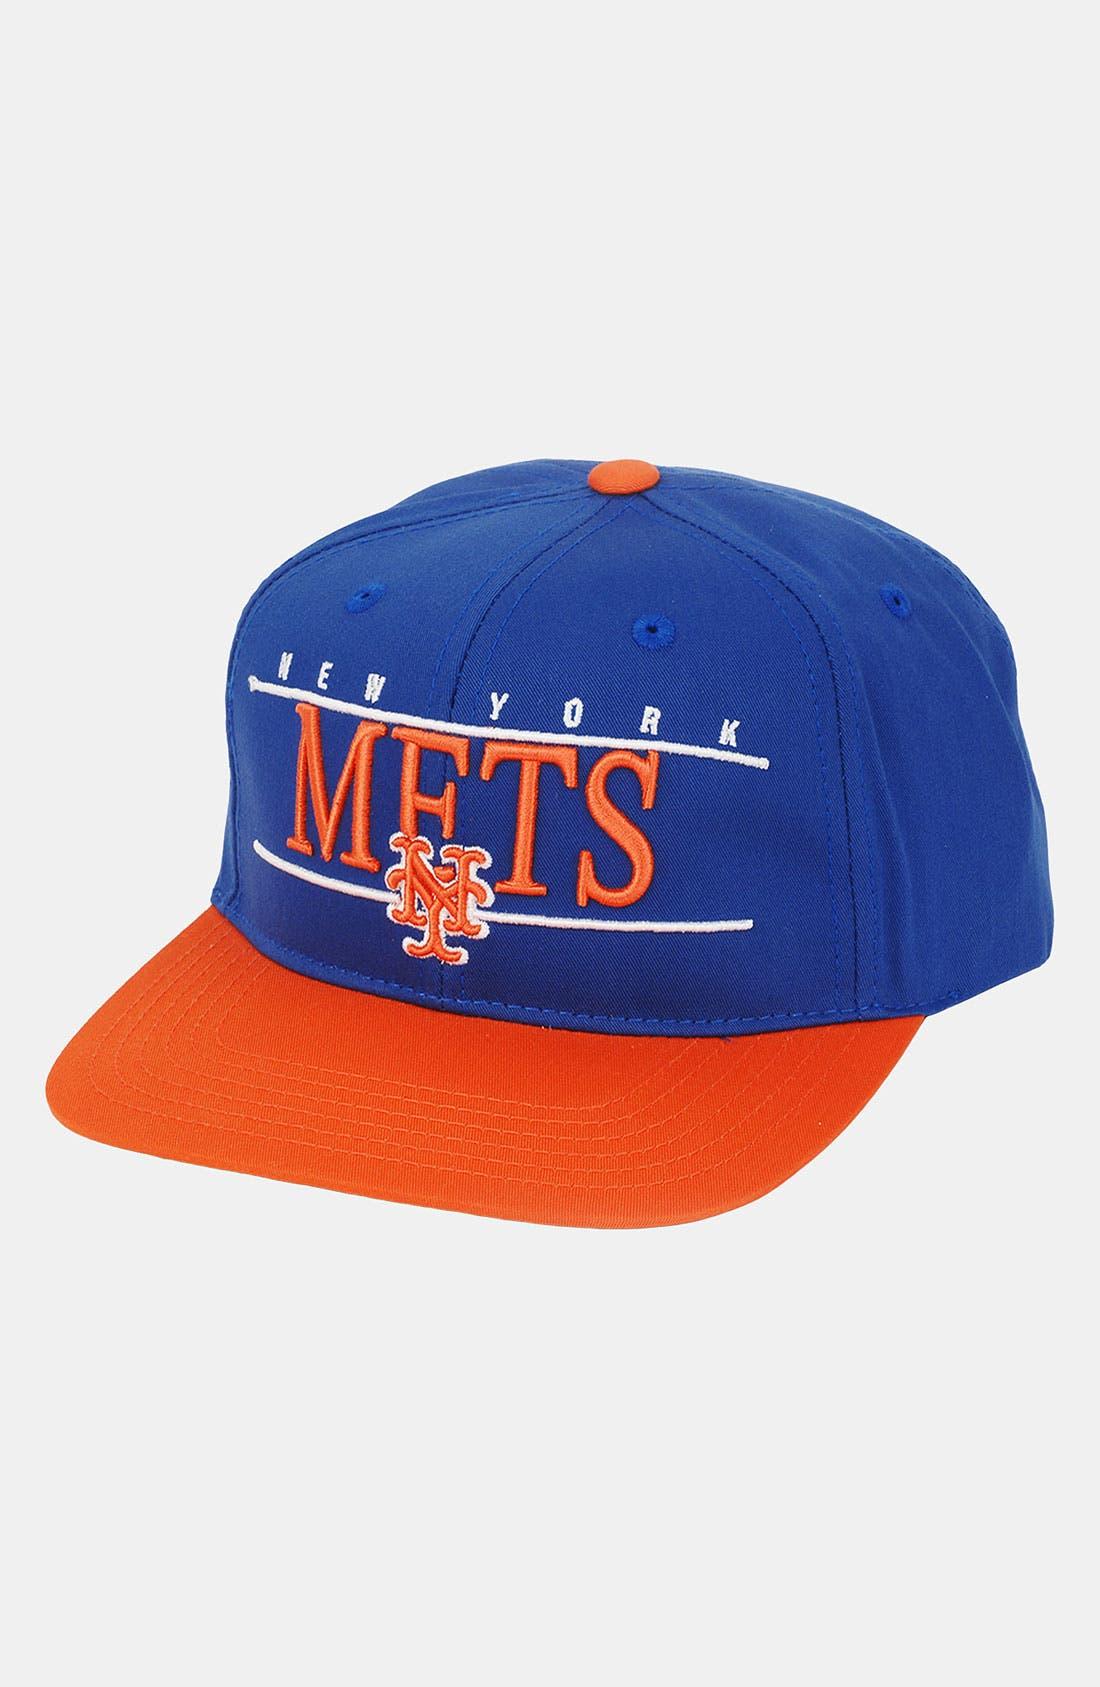 Alternate Image 1 Selected - American Needle 'New York Mets - Nineties' Twill Snapback Baseball Cap